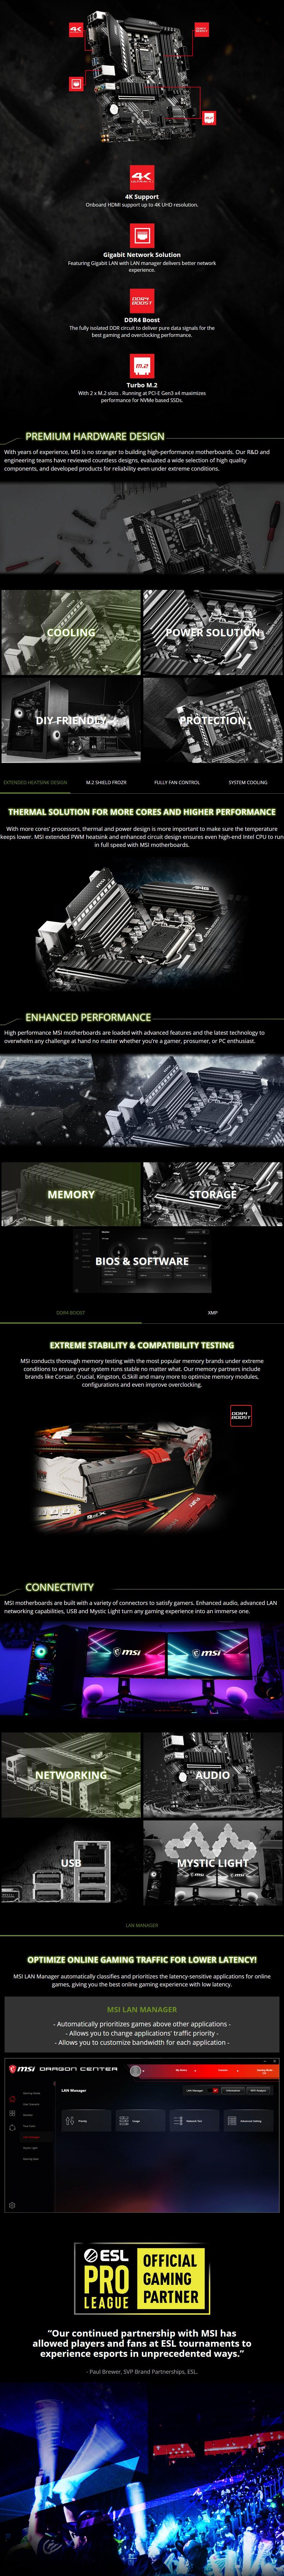 MSI MAG B460M BAZOOKA LGA 1200 Micro-ATX Motherboard - Overview 1